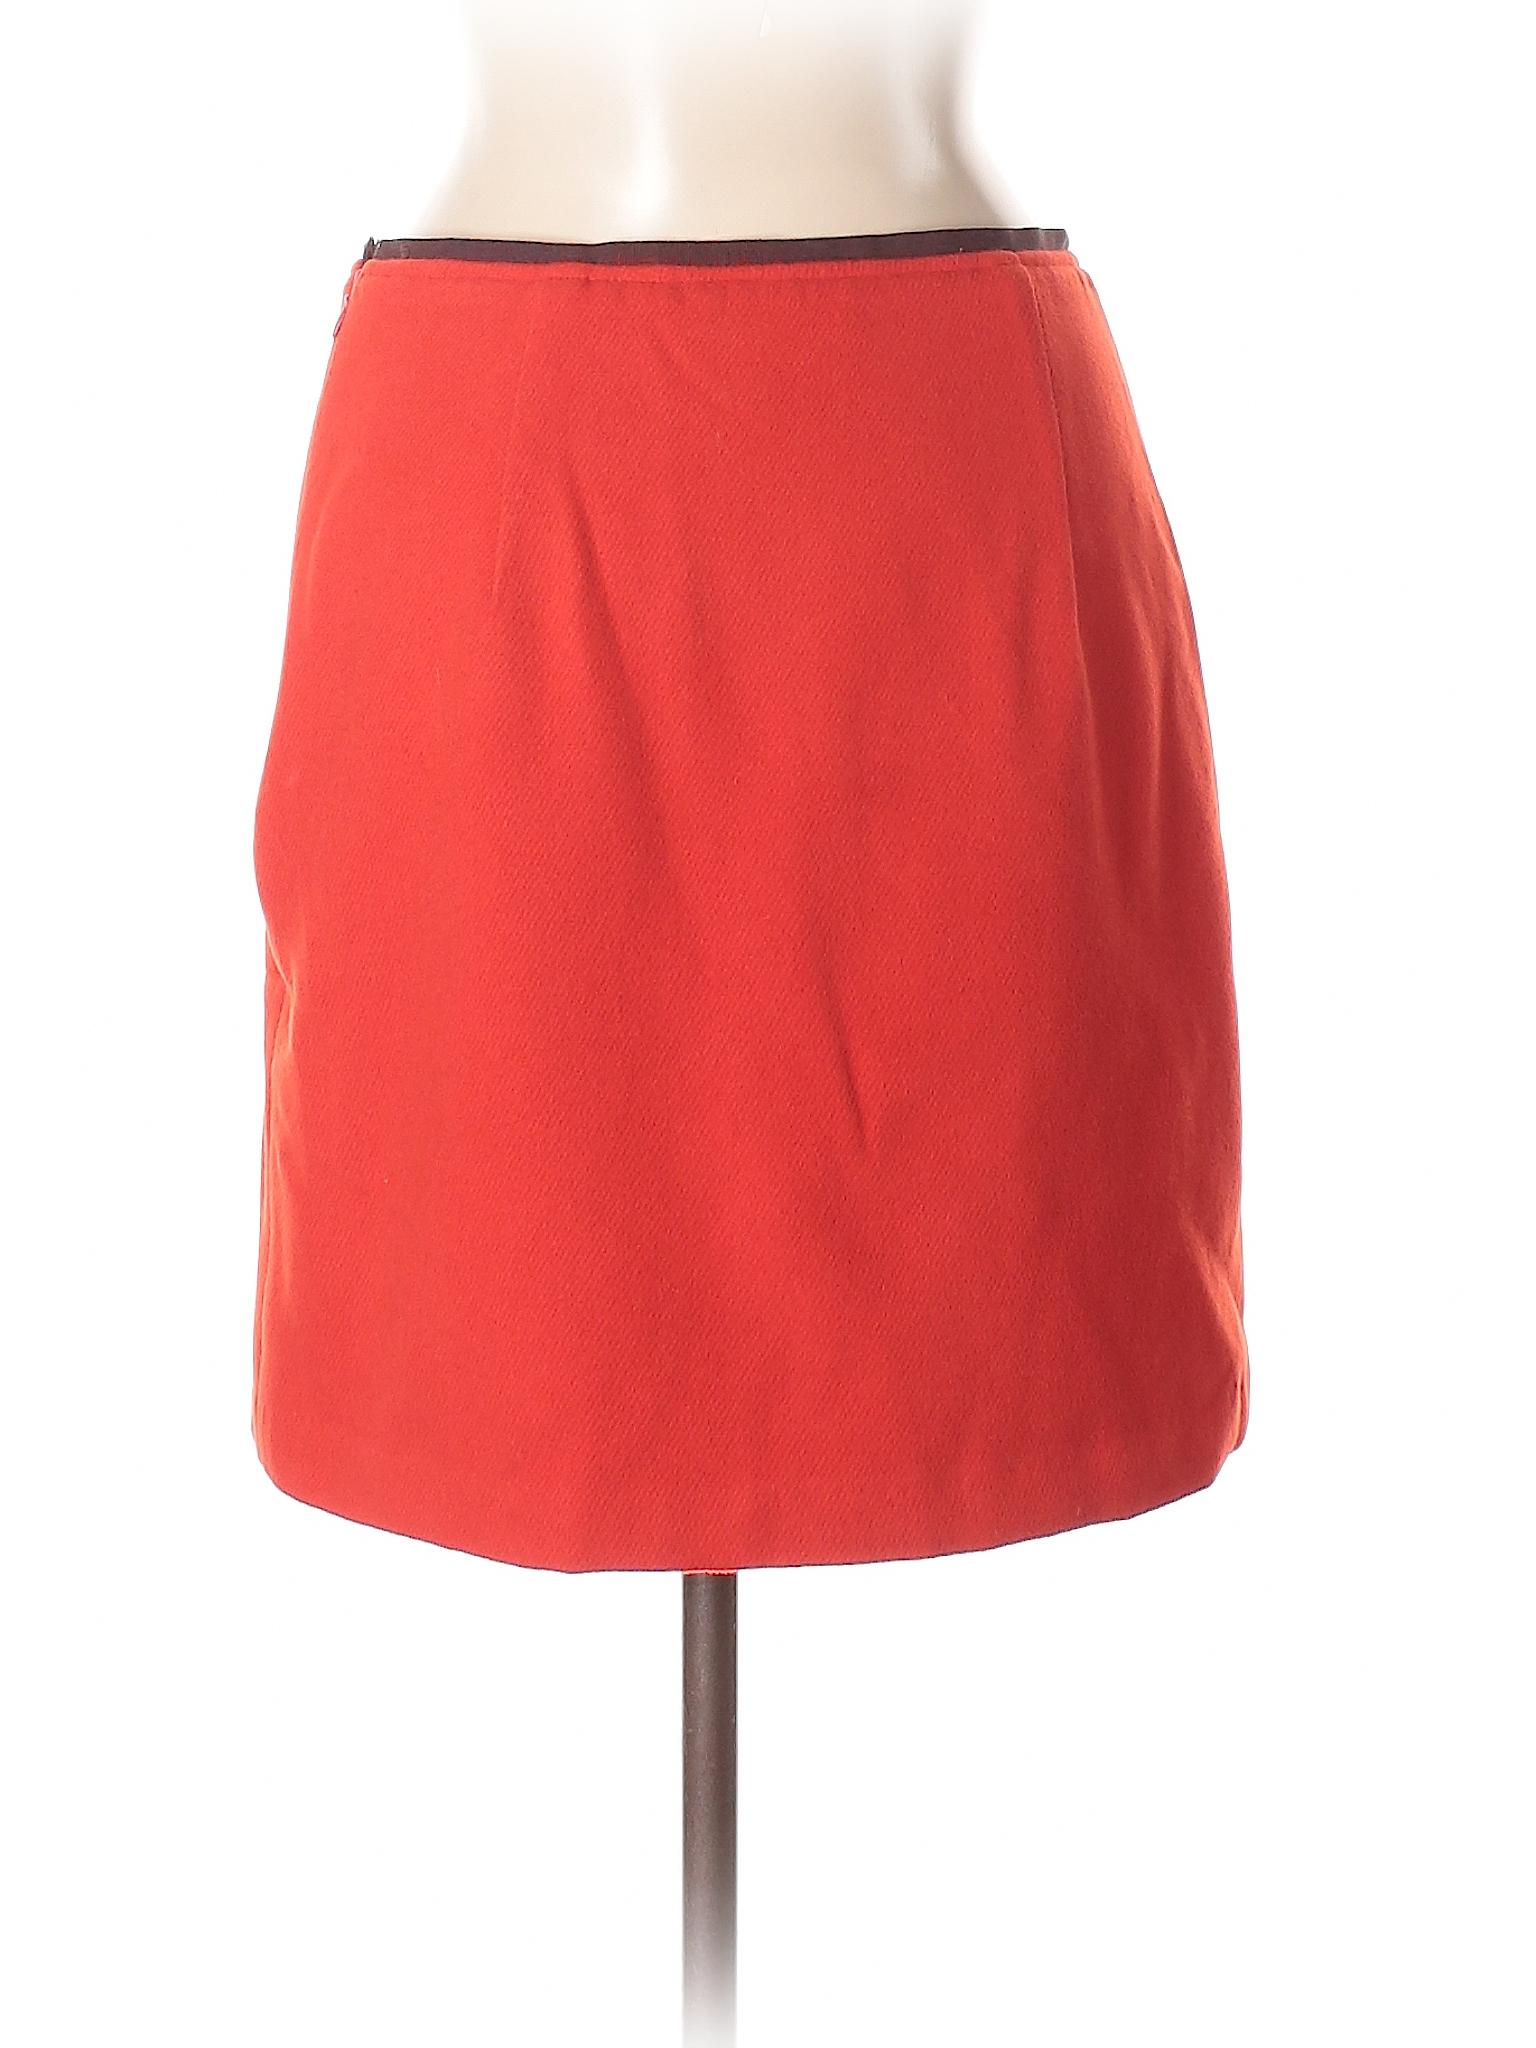 Boutique Skirt Sfizio Wool Sfizio Sfizio Skirt Sfizio Skirt Wool Wool Wool Boutique Boutique Boutique CxvqTOwn